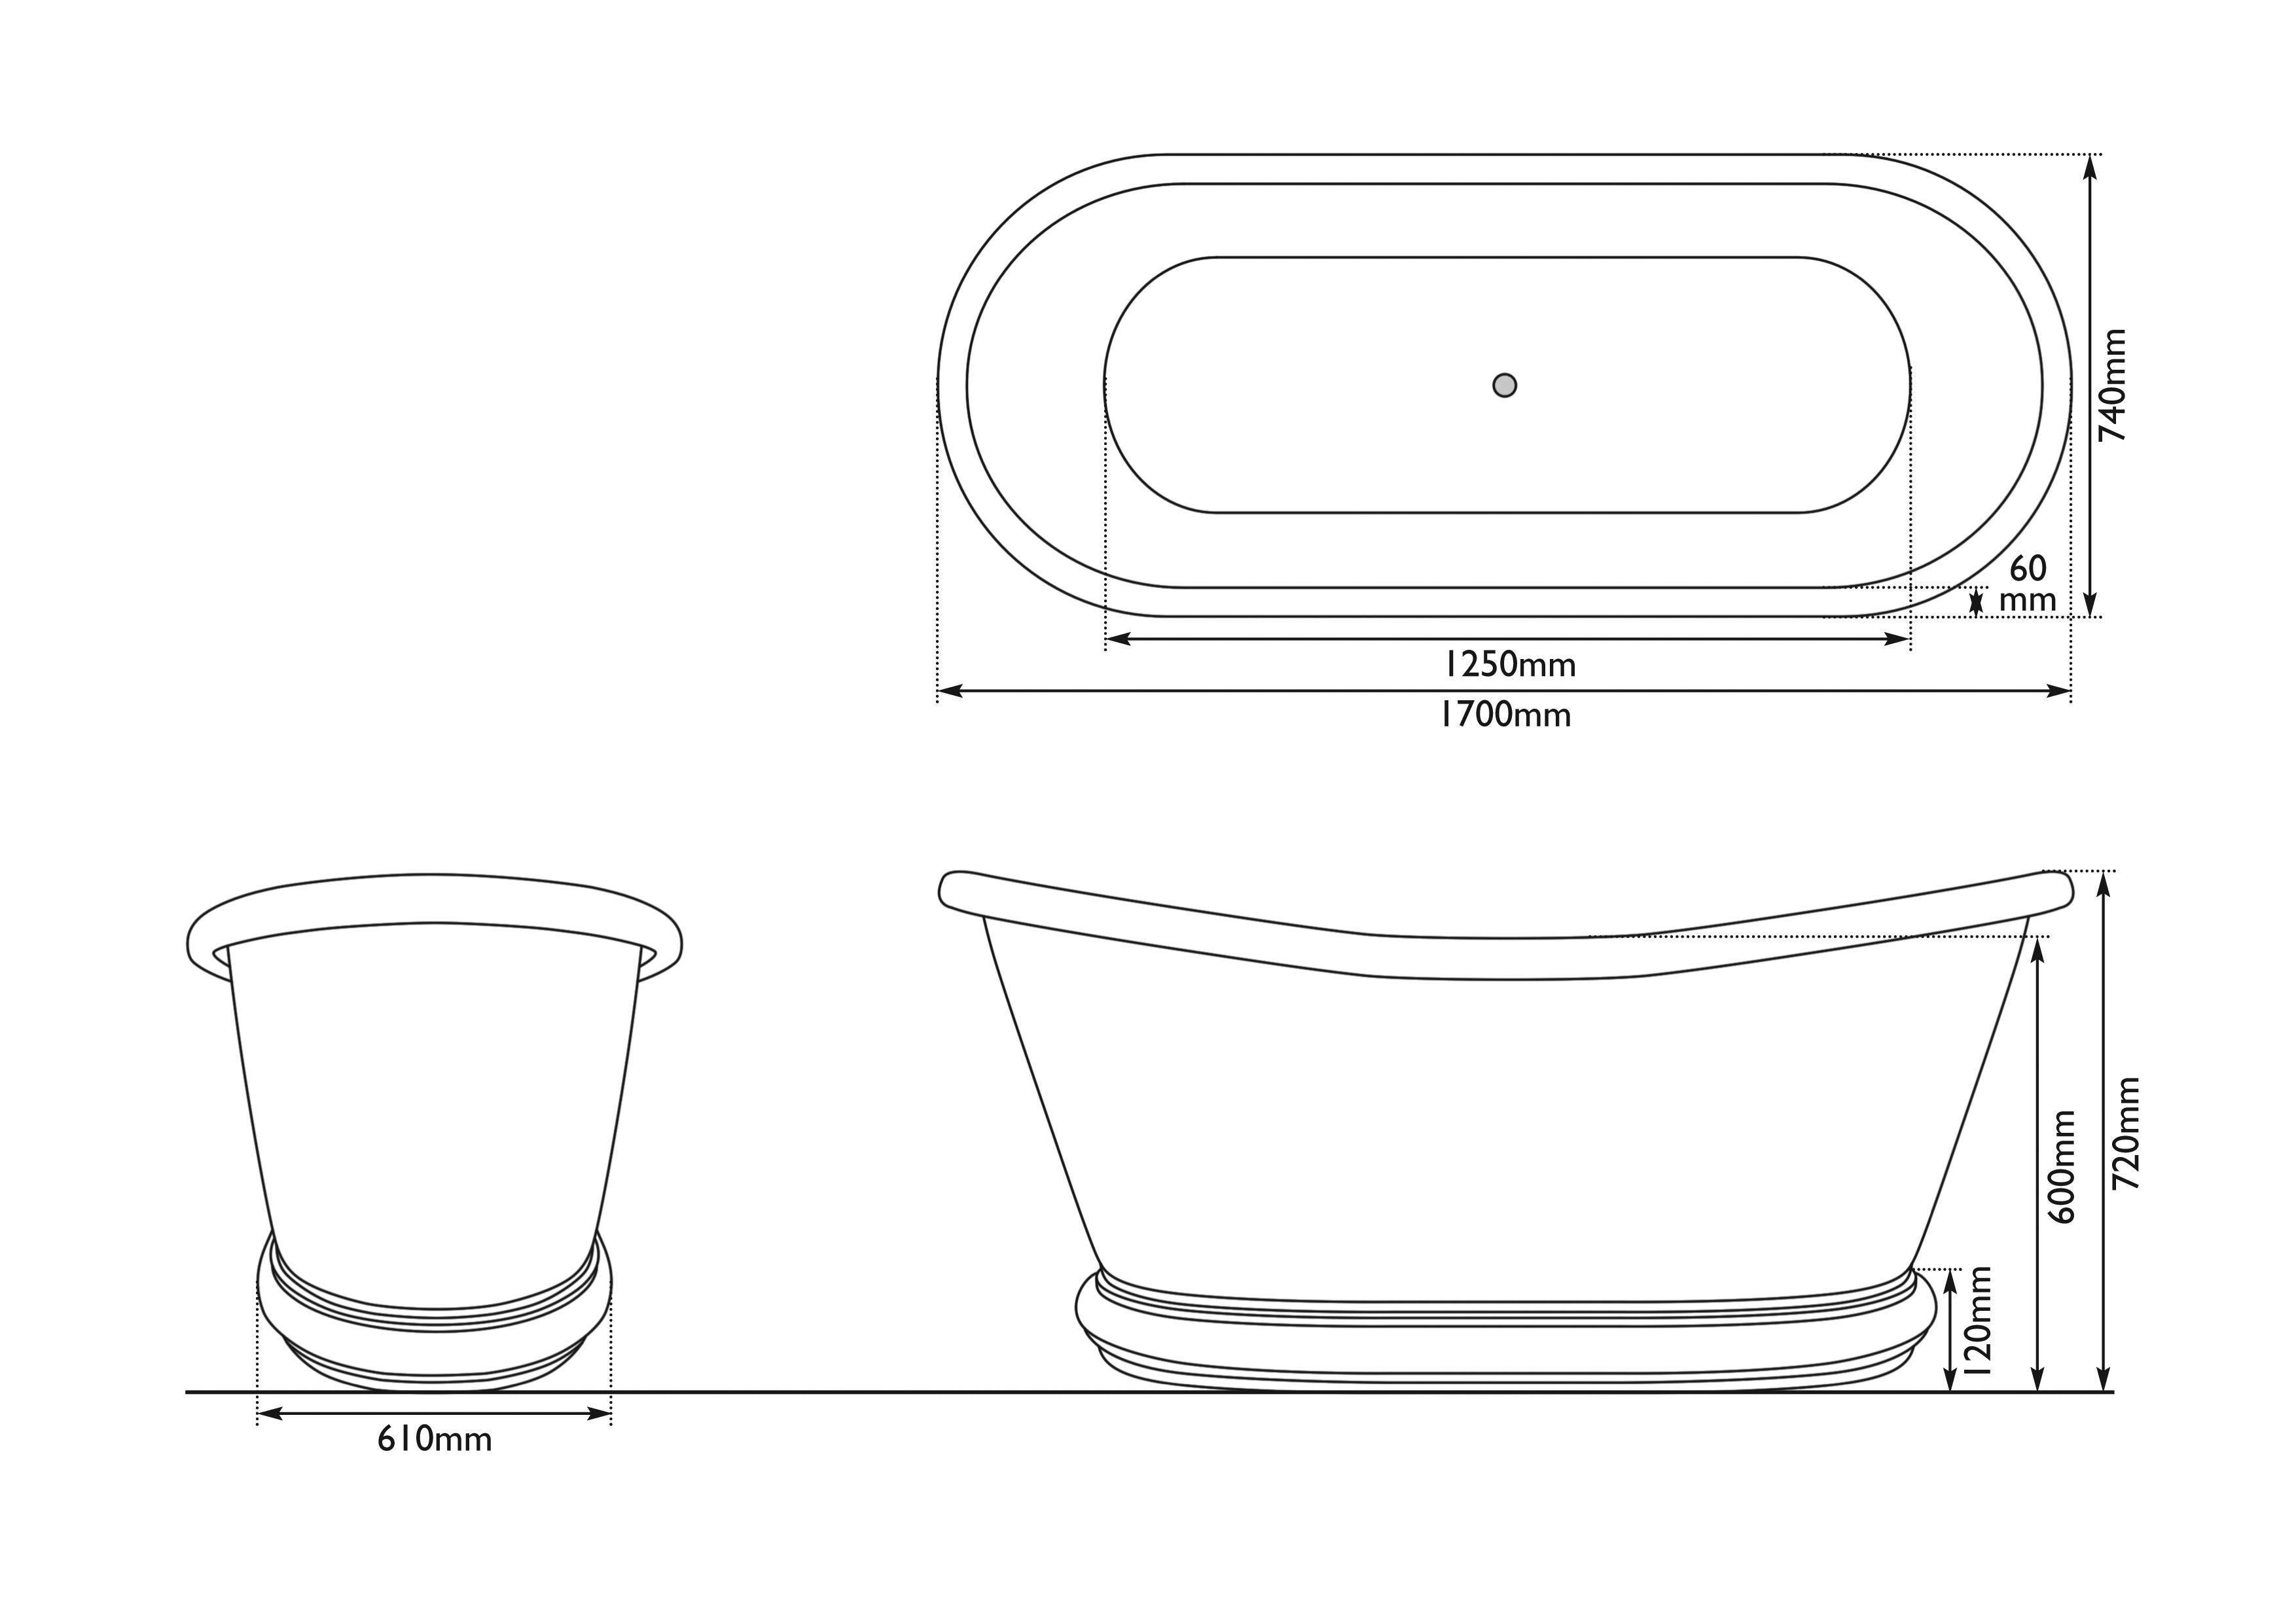 Dimensions Of Hurlingham Copper Bulle Copper Exterior and Nickel Interior Bath